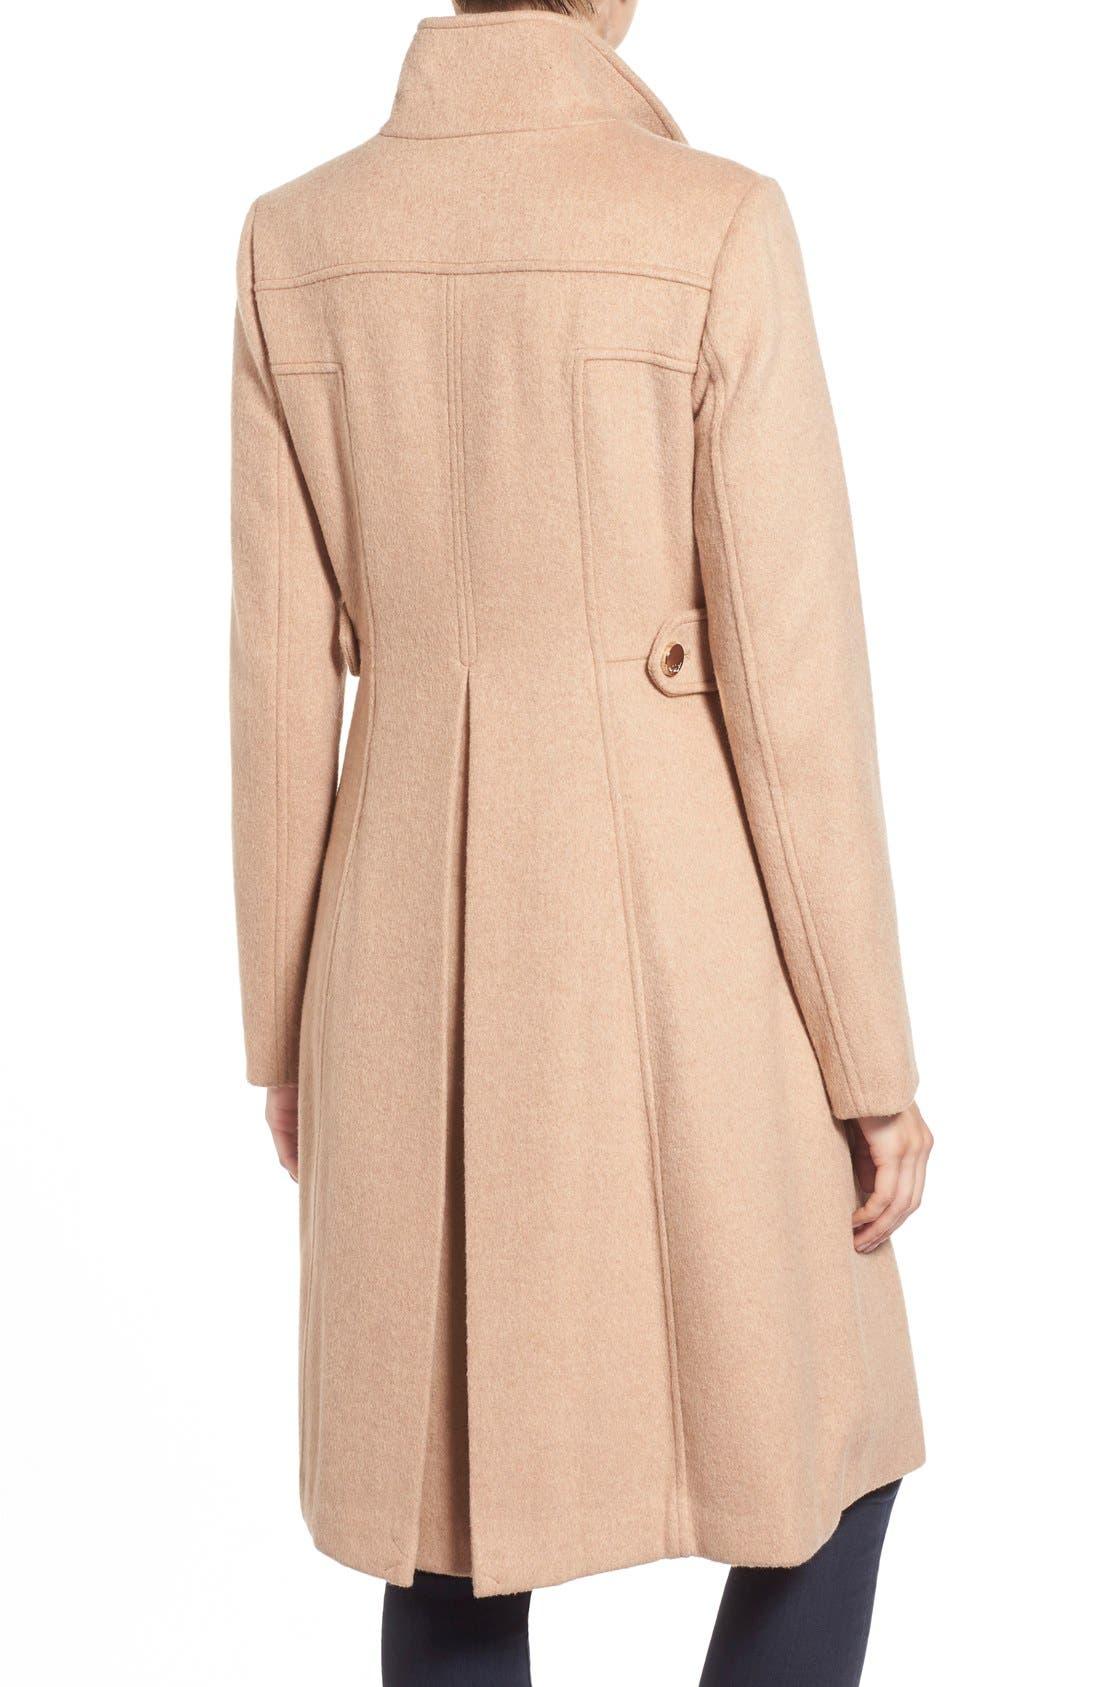 Wool Blend Long Military Coat,                             Alternate thumbnail 2, color,                             Camel